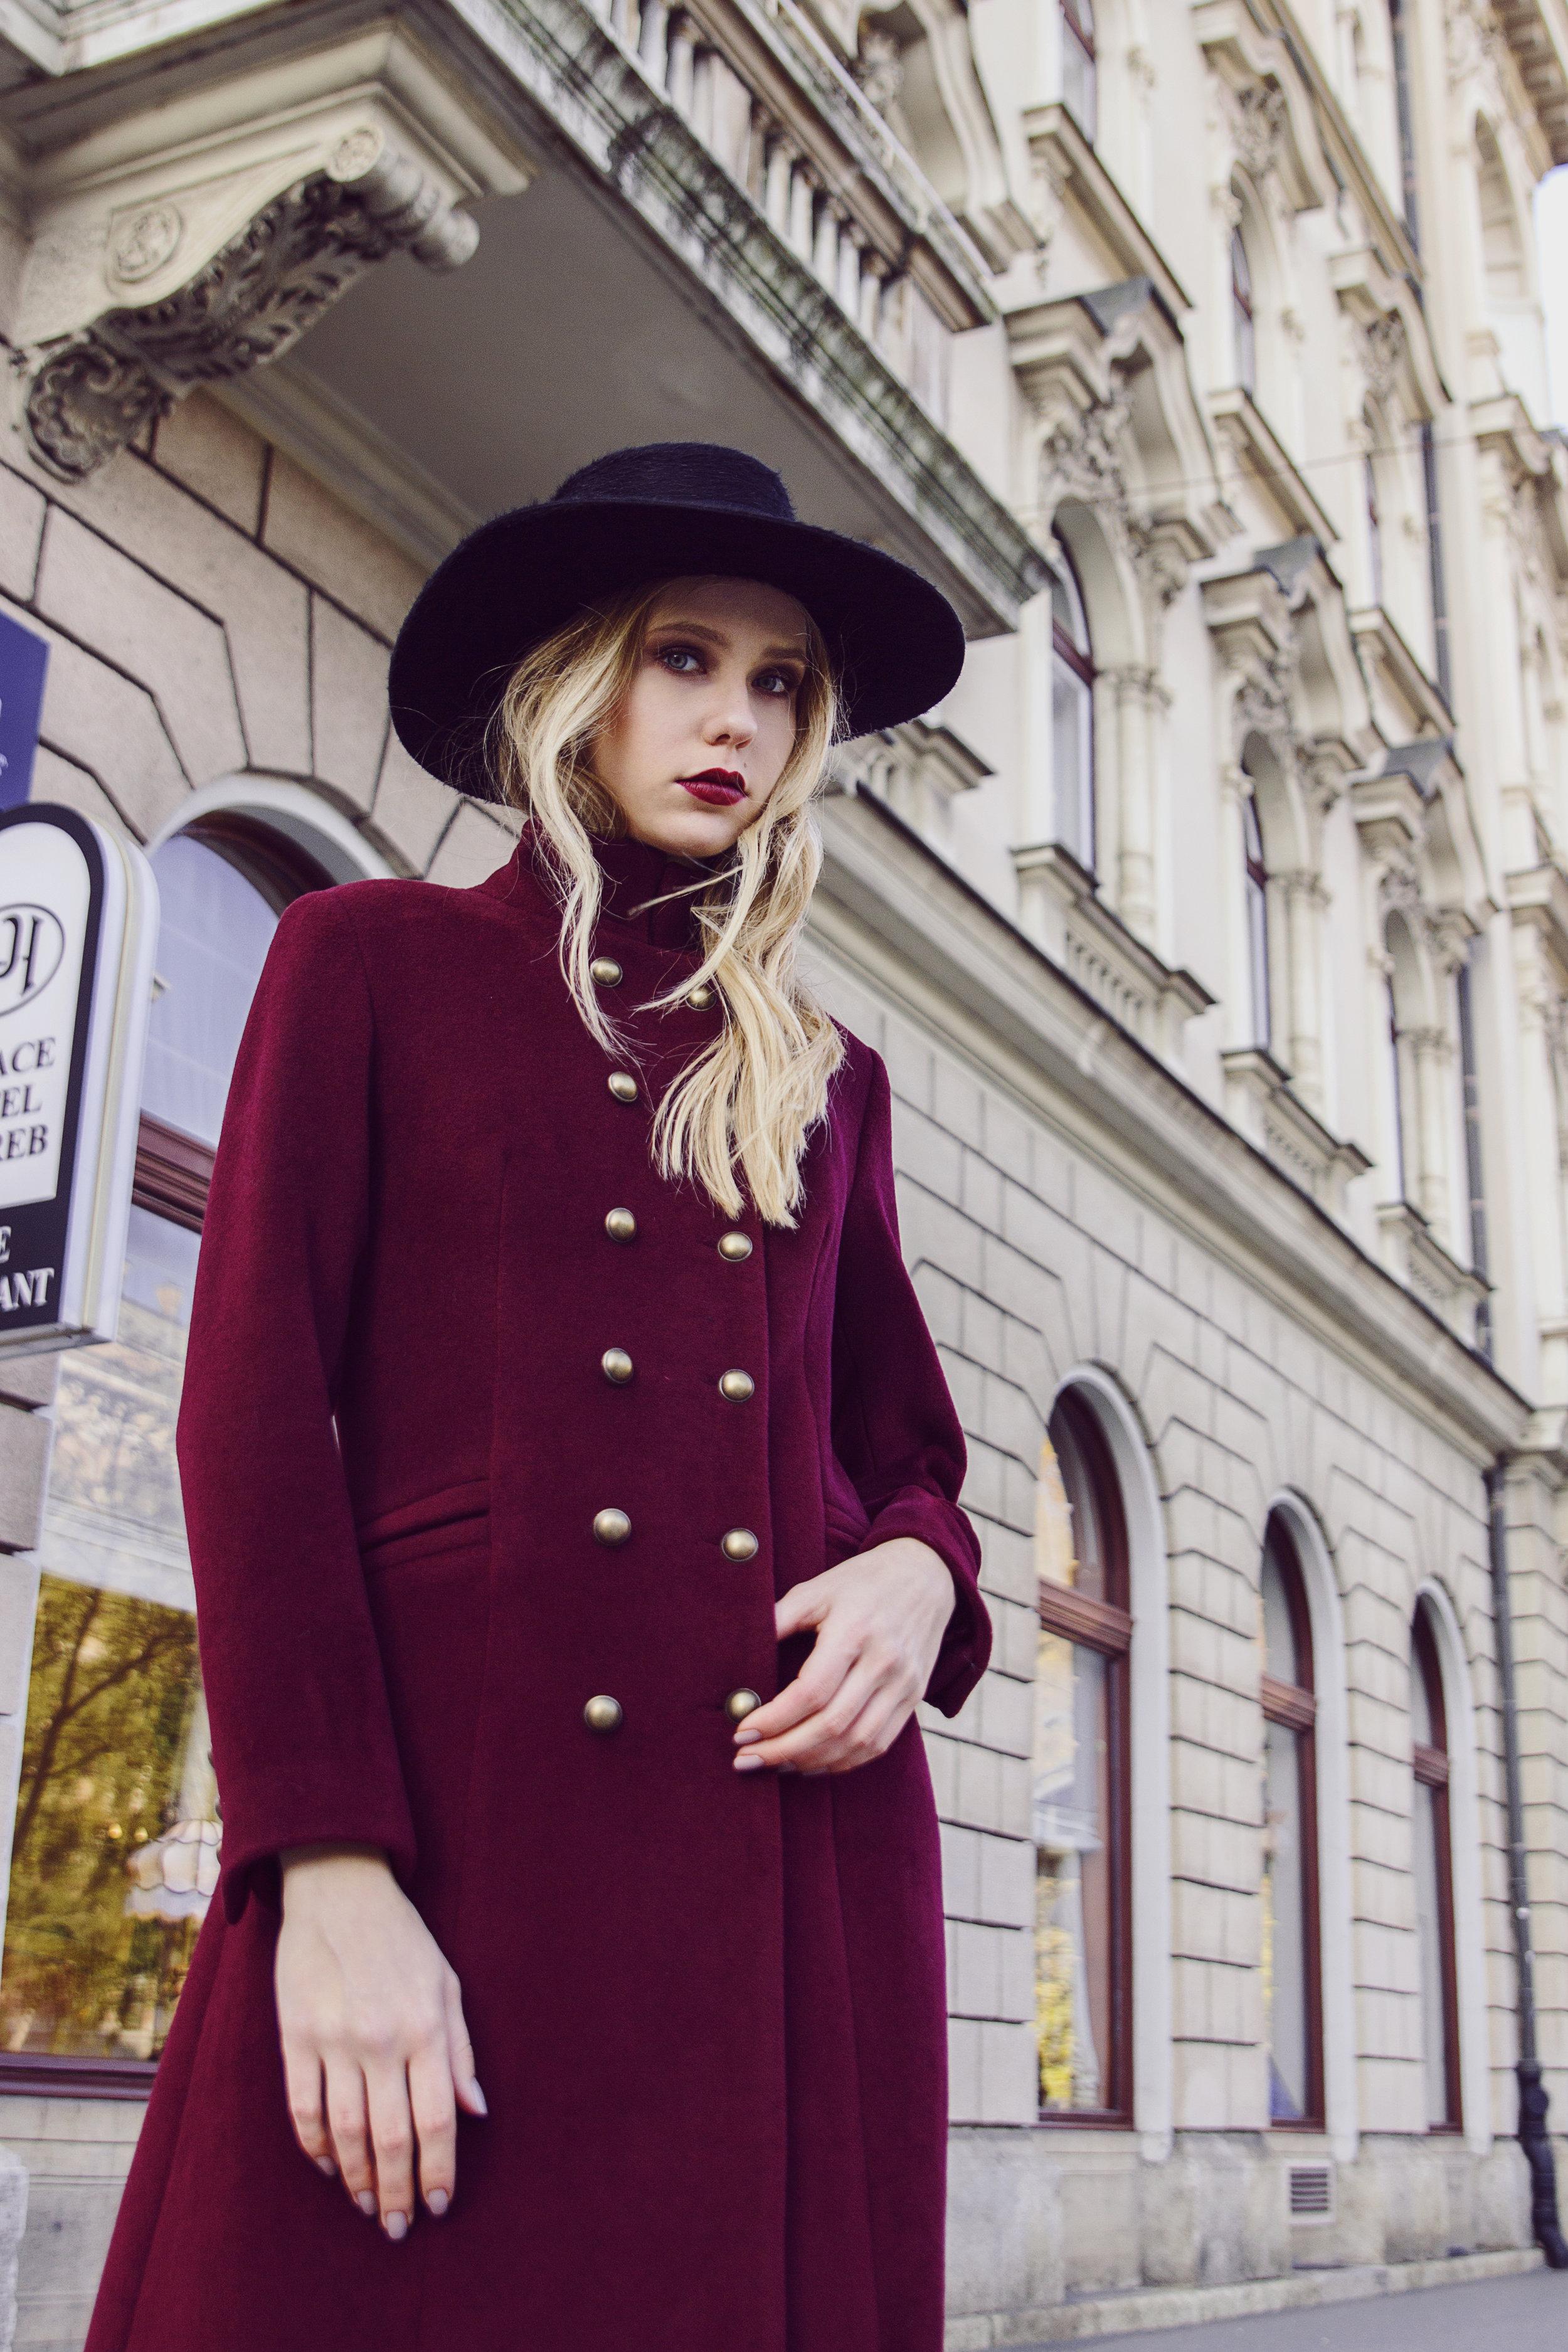 luka-lajic-fashion-photography-joliehr-hotel-palace-anamaria-ricov-robert-sever-loreta-gudelj-shoebox-talia-models (13).jpg